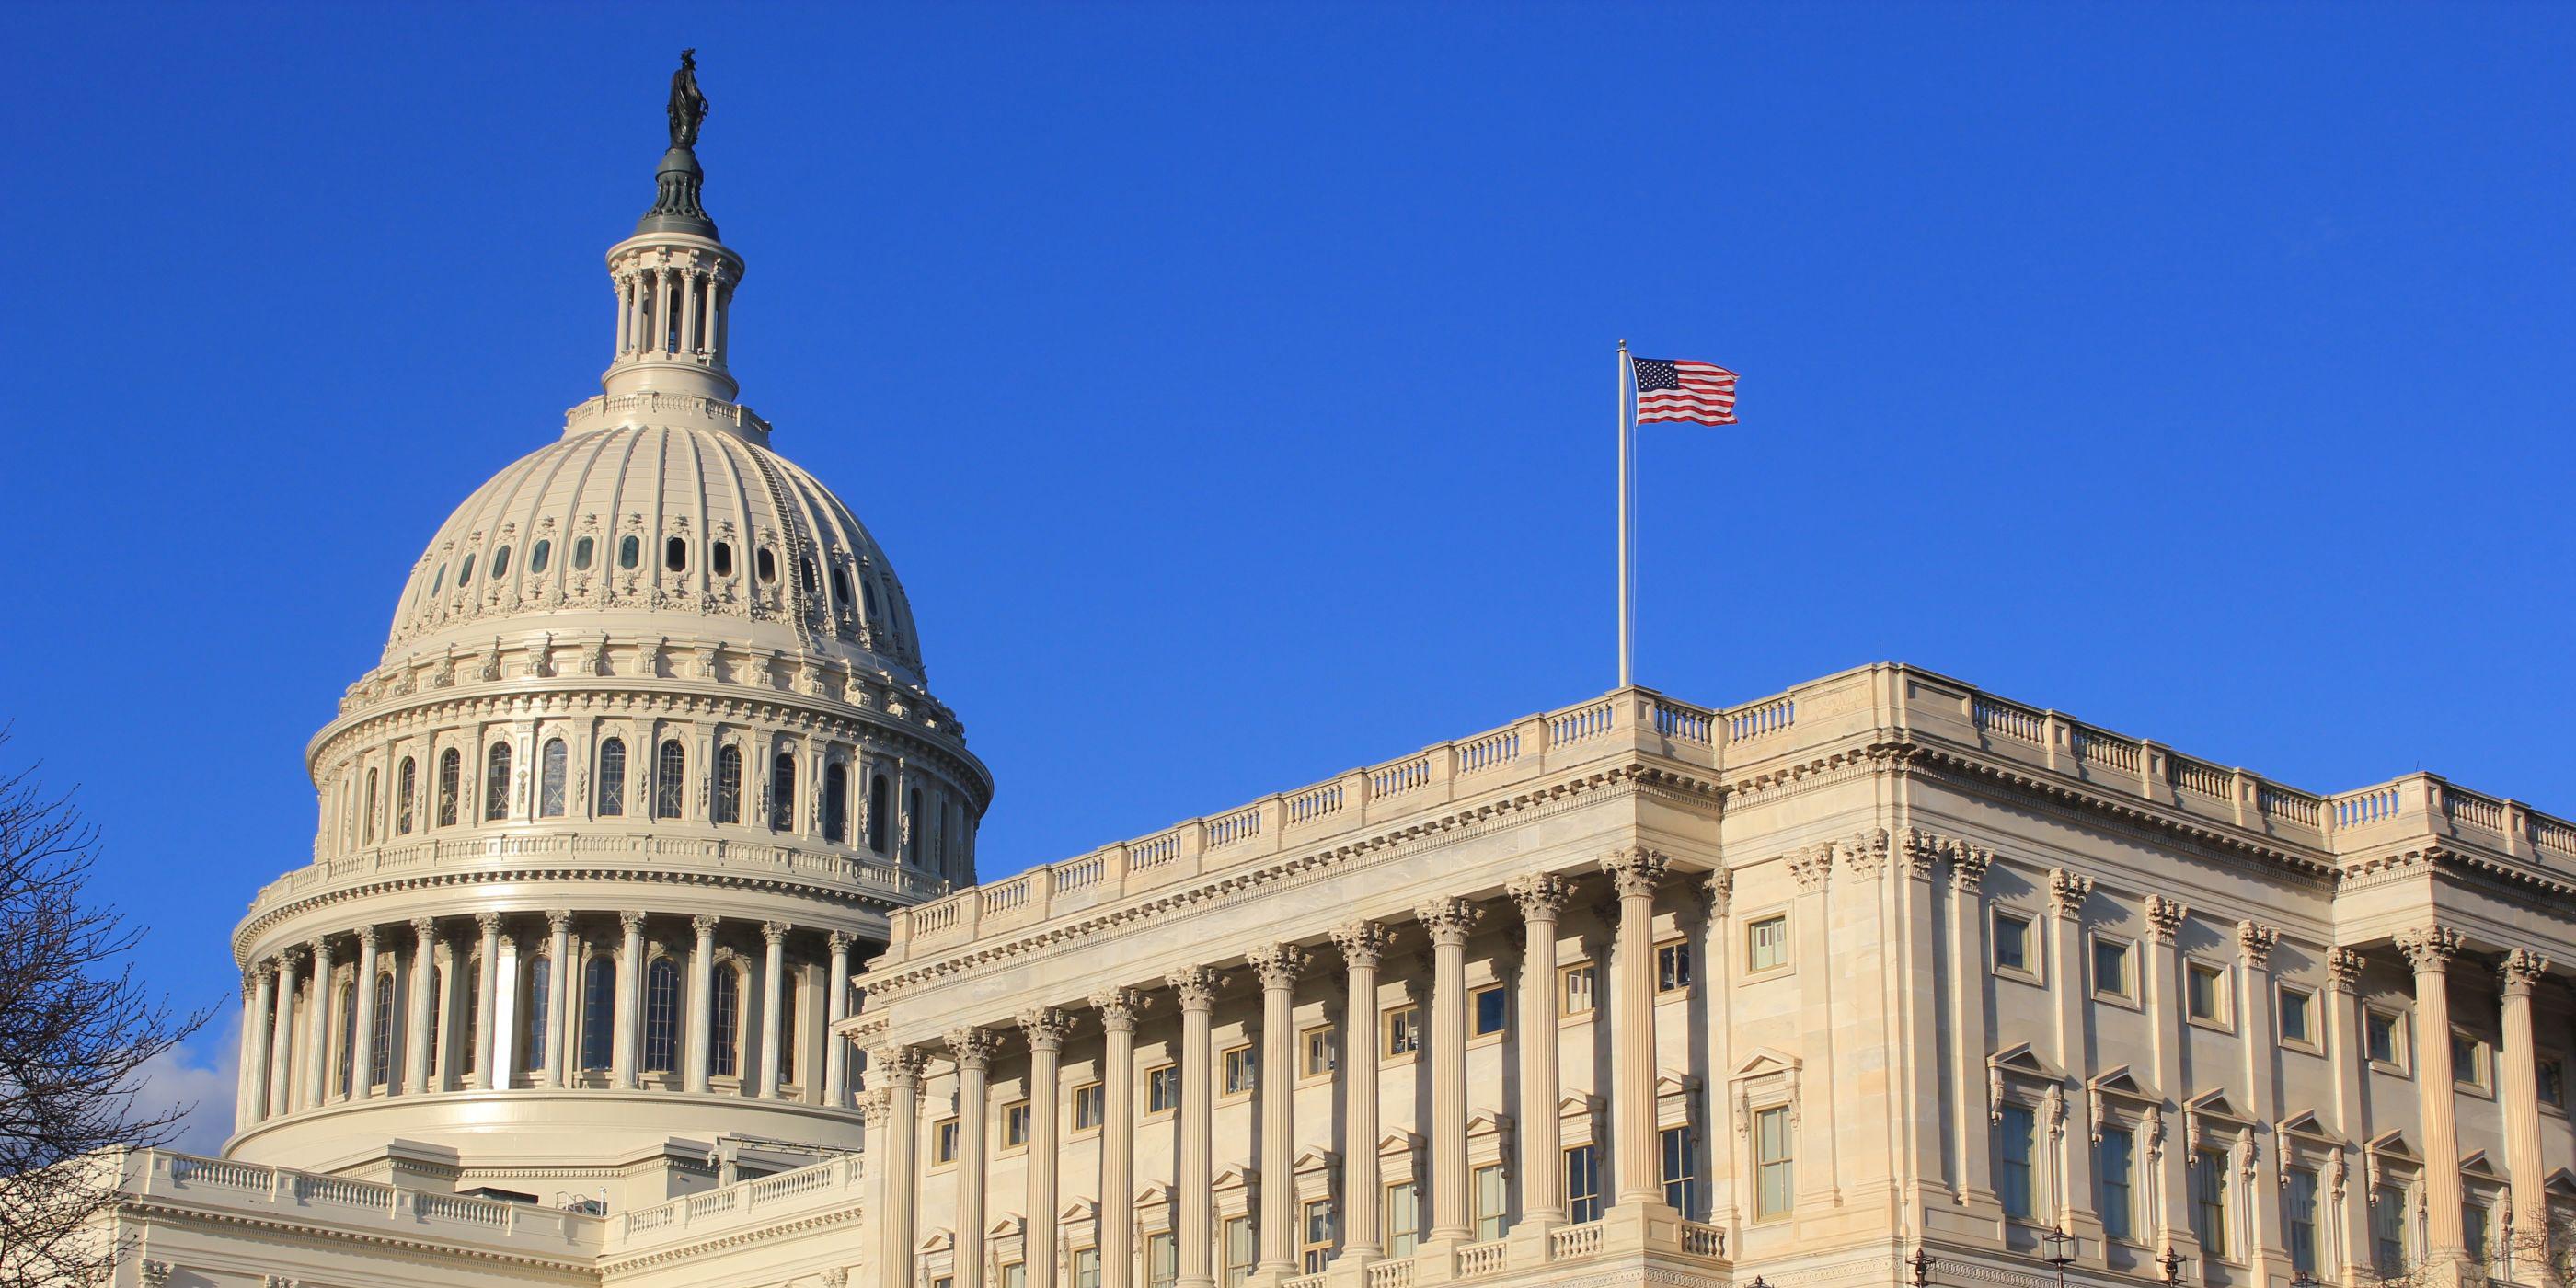 Blue skies over Washington DC